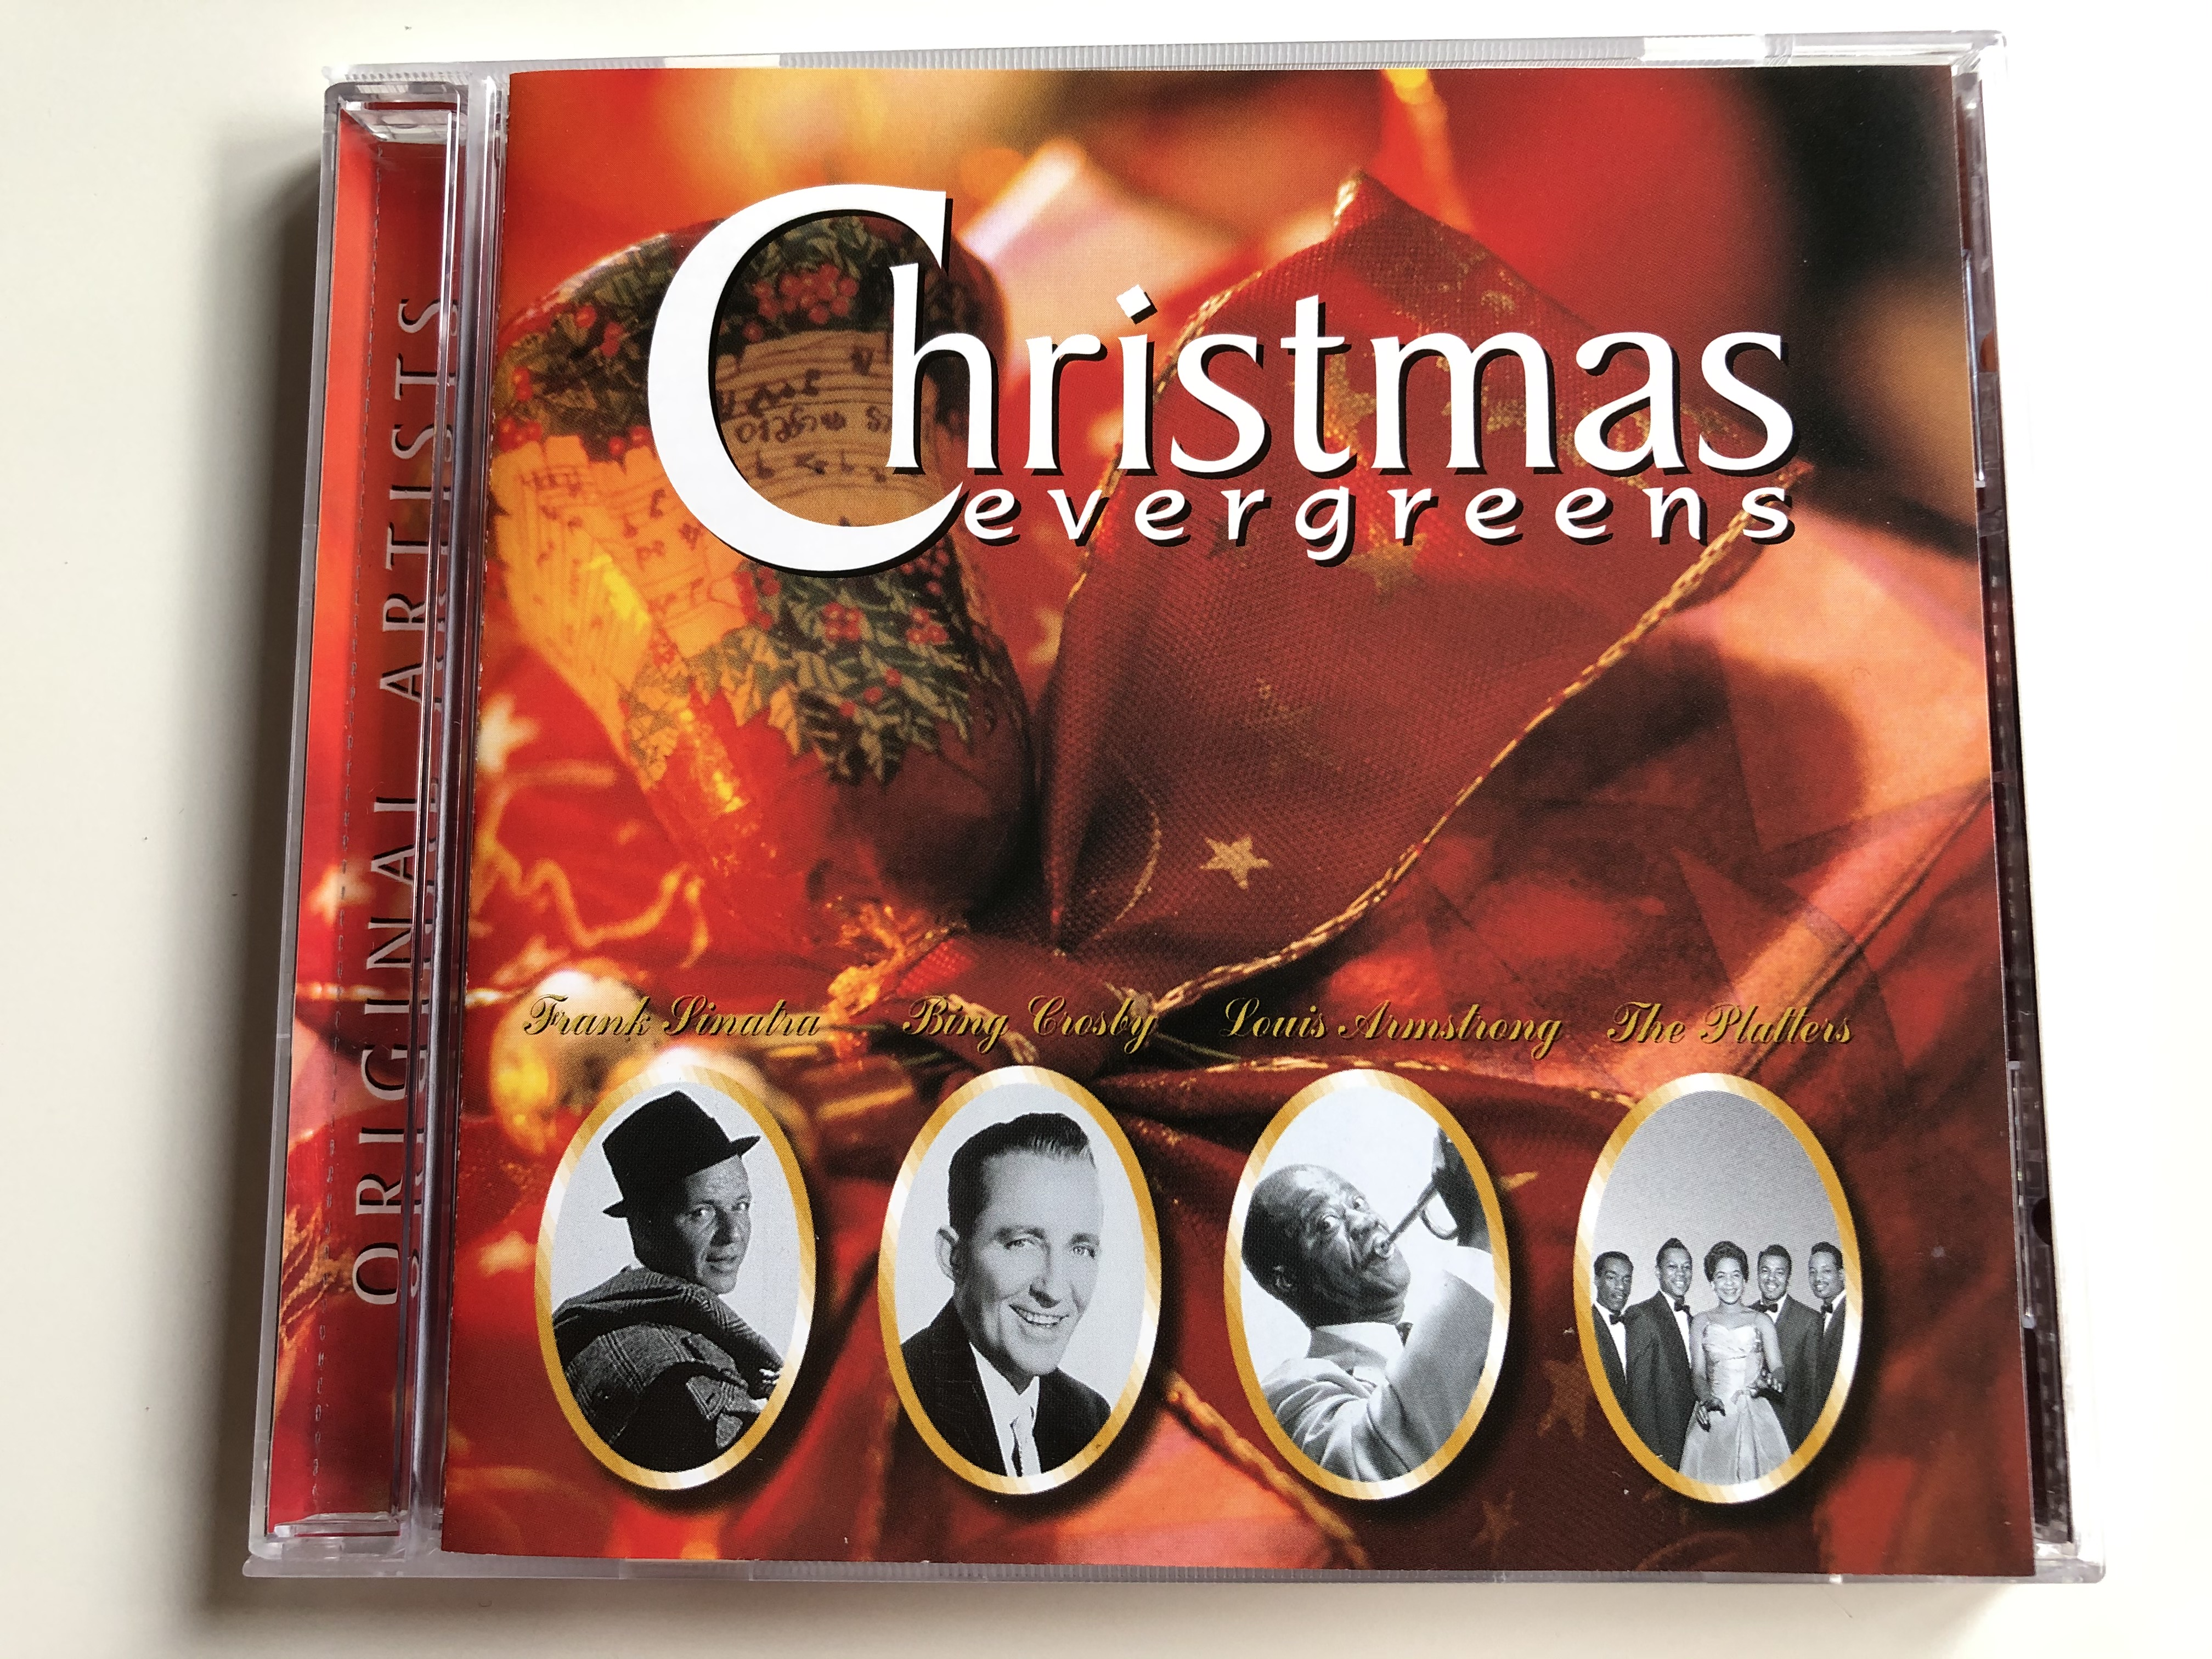 christmas-evergreens-frank-sinatra-bing-crosby-louis-armstrong-the-platters-elap-audio-cd-2000-51583132-1-.jpg